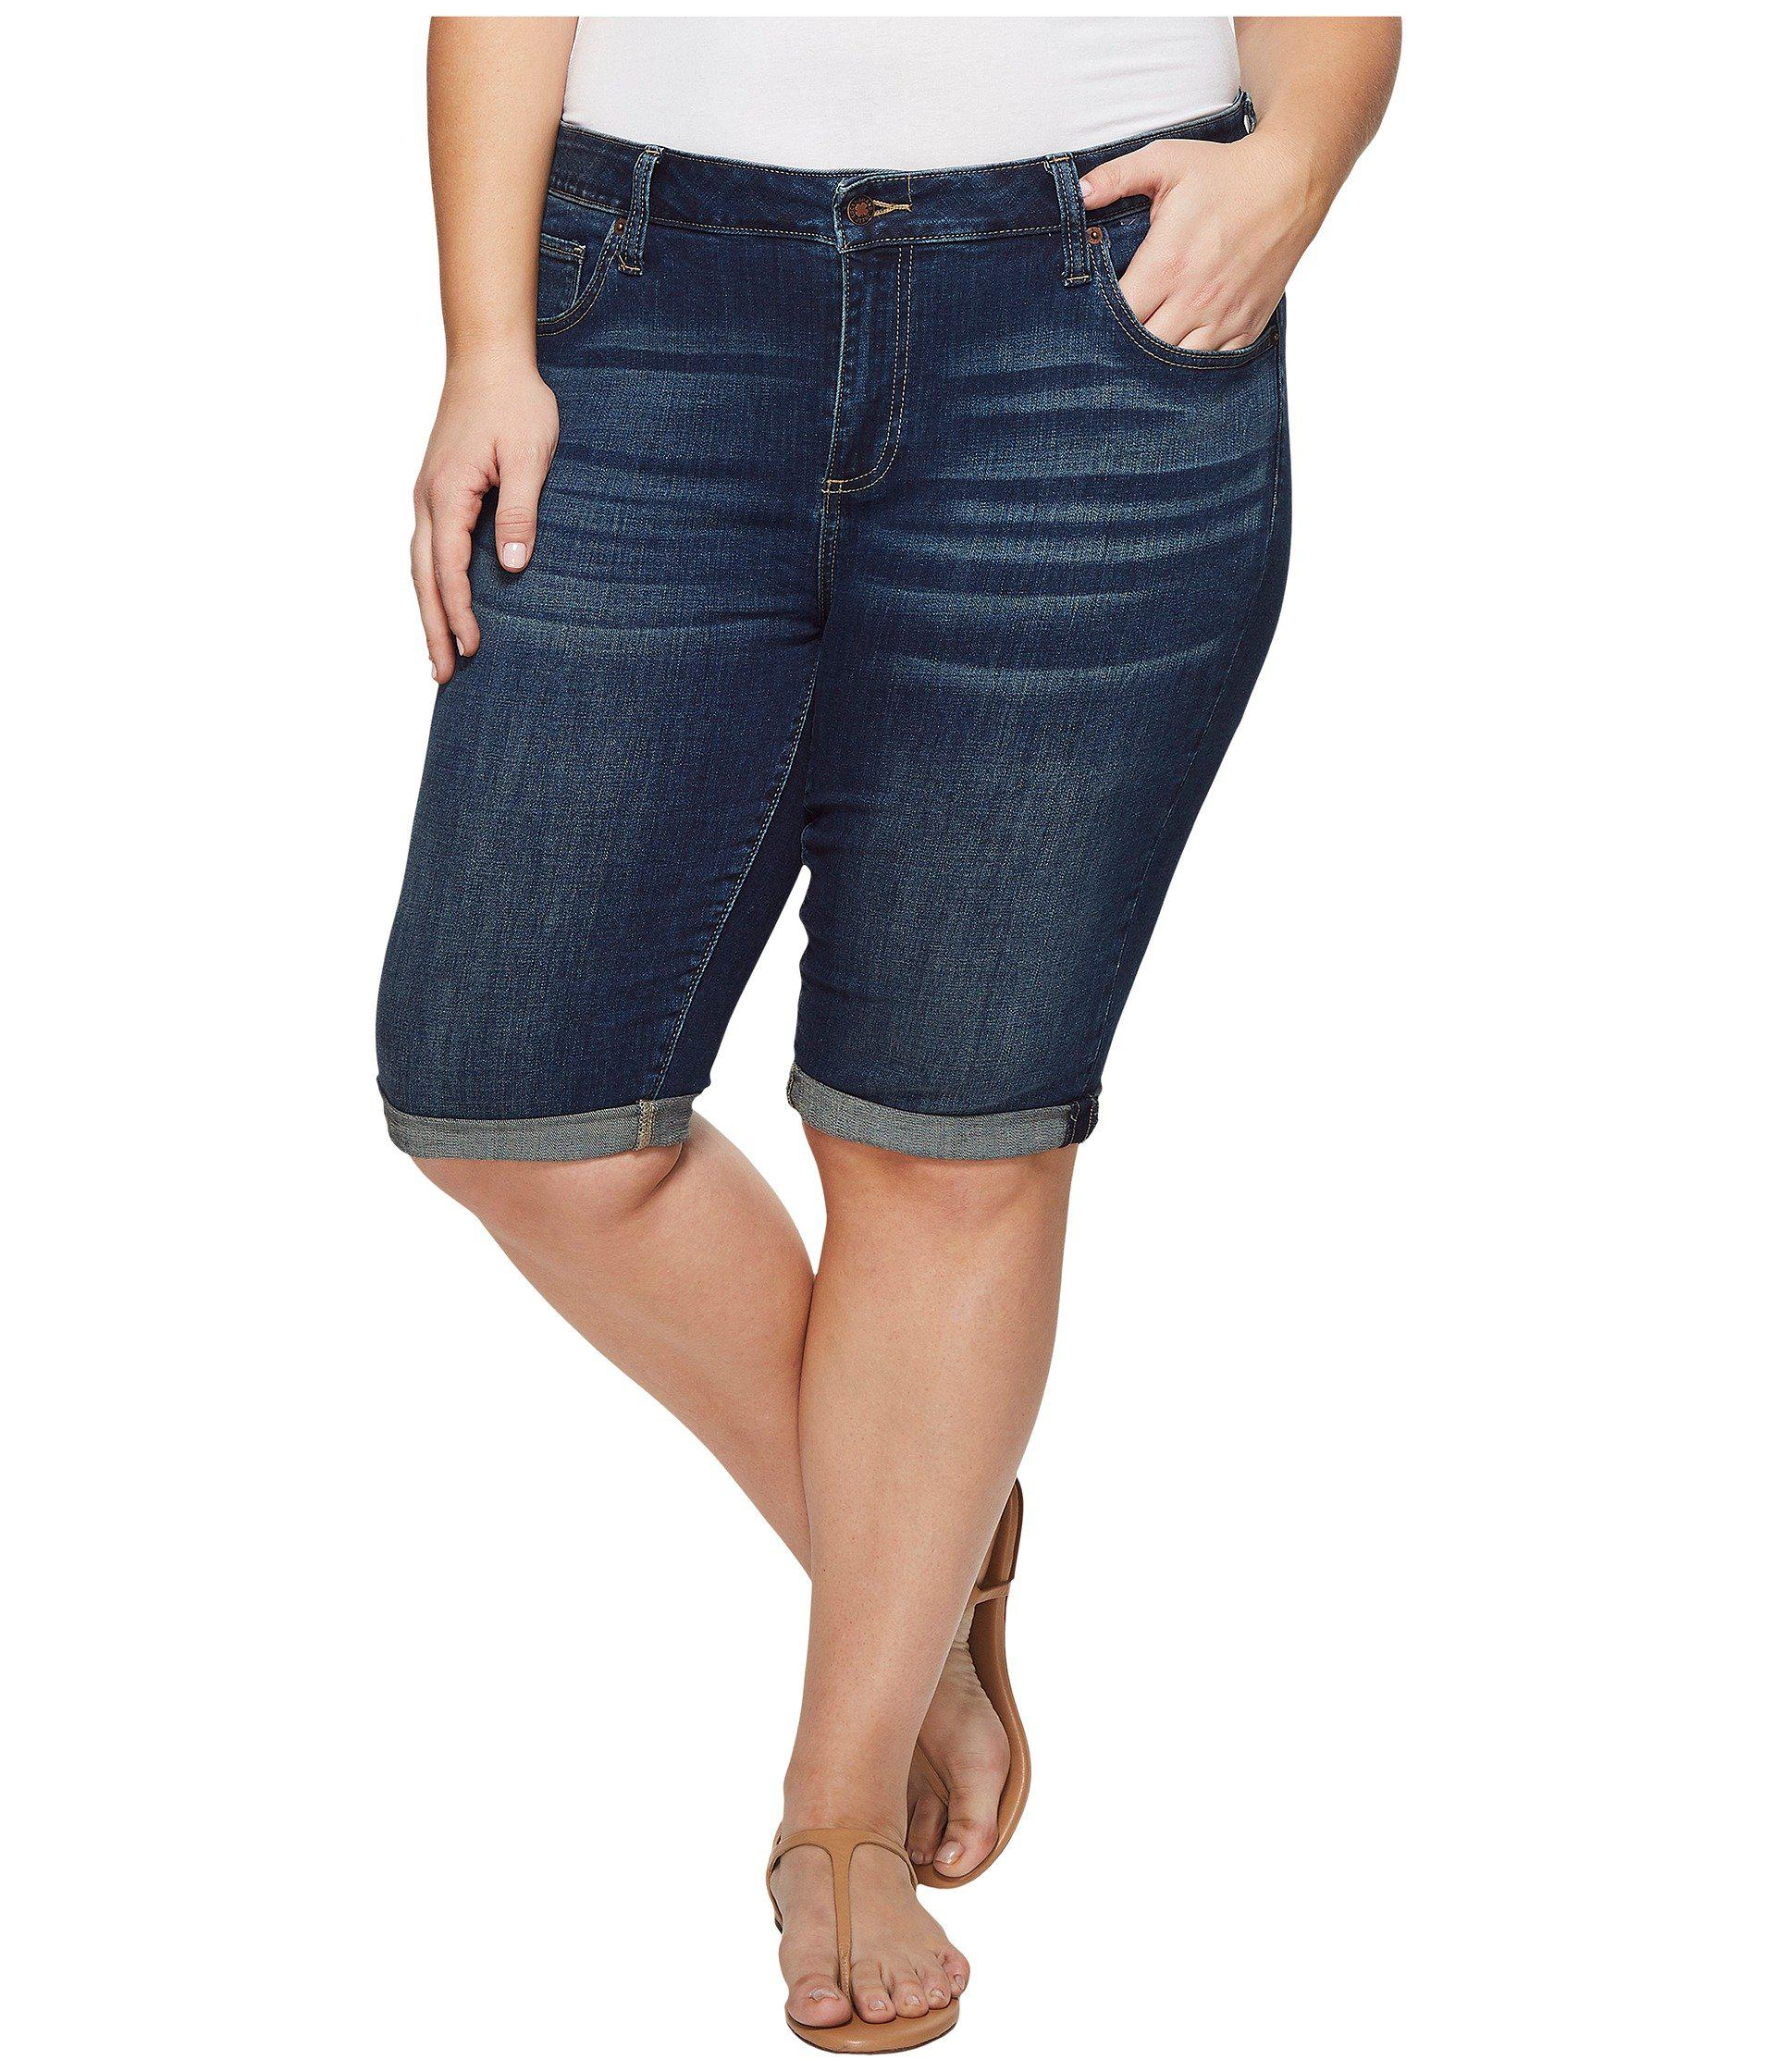 Lucky Brand Womens Plus Size Mid Rise Ginger Bermuda Short in Bear Lake Bermuda Shorts